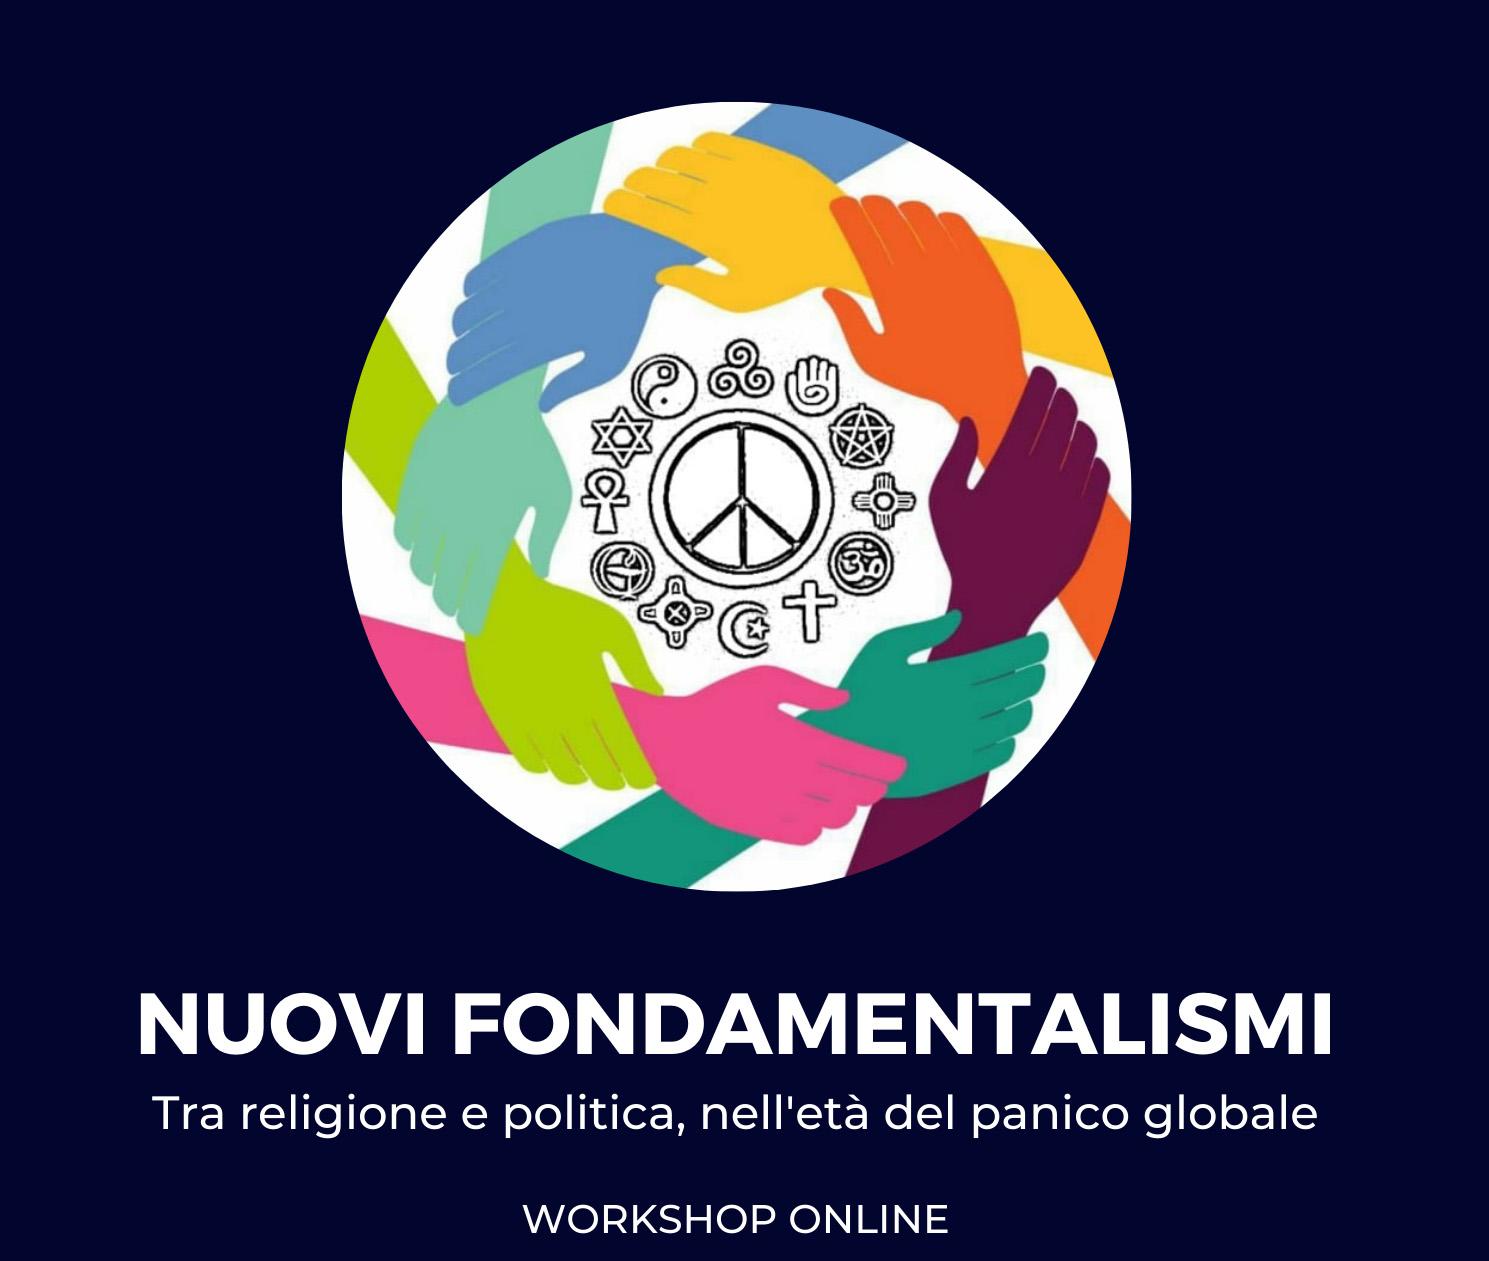 Cesepc_Nuovi fondamentalismi